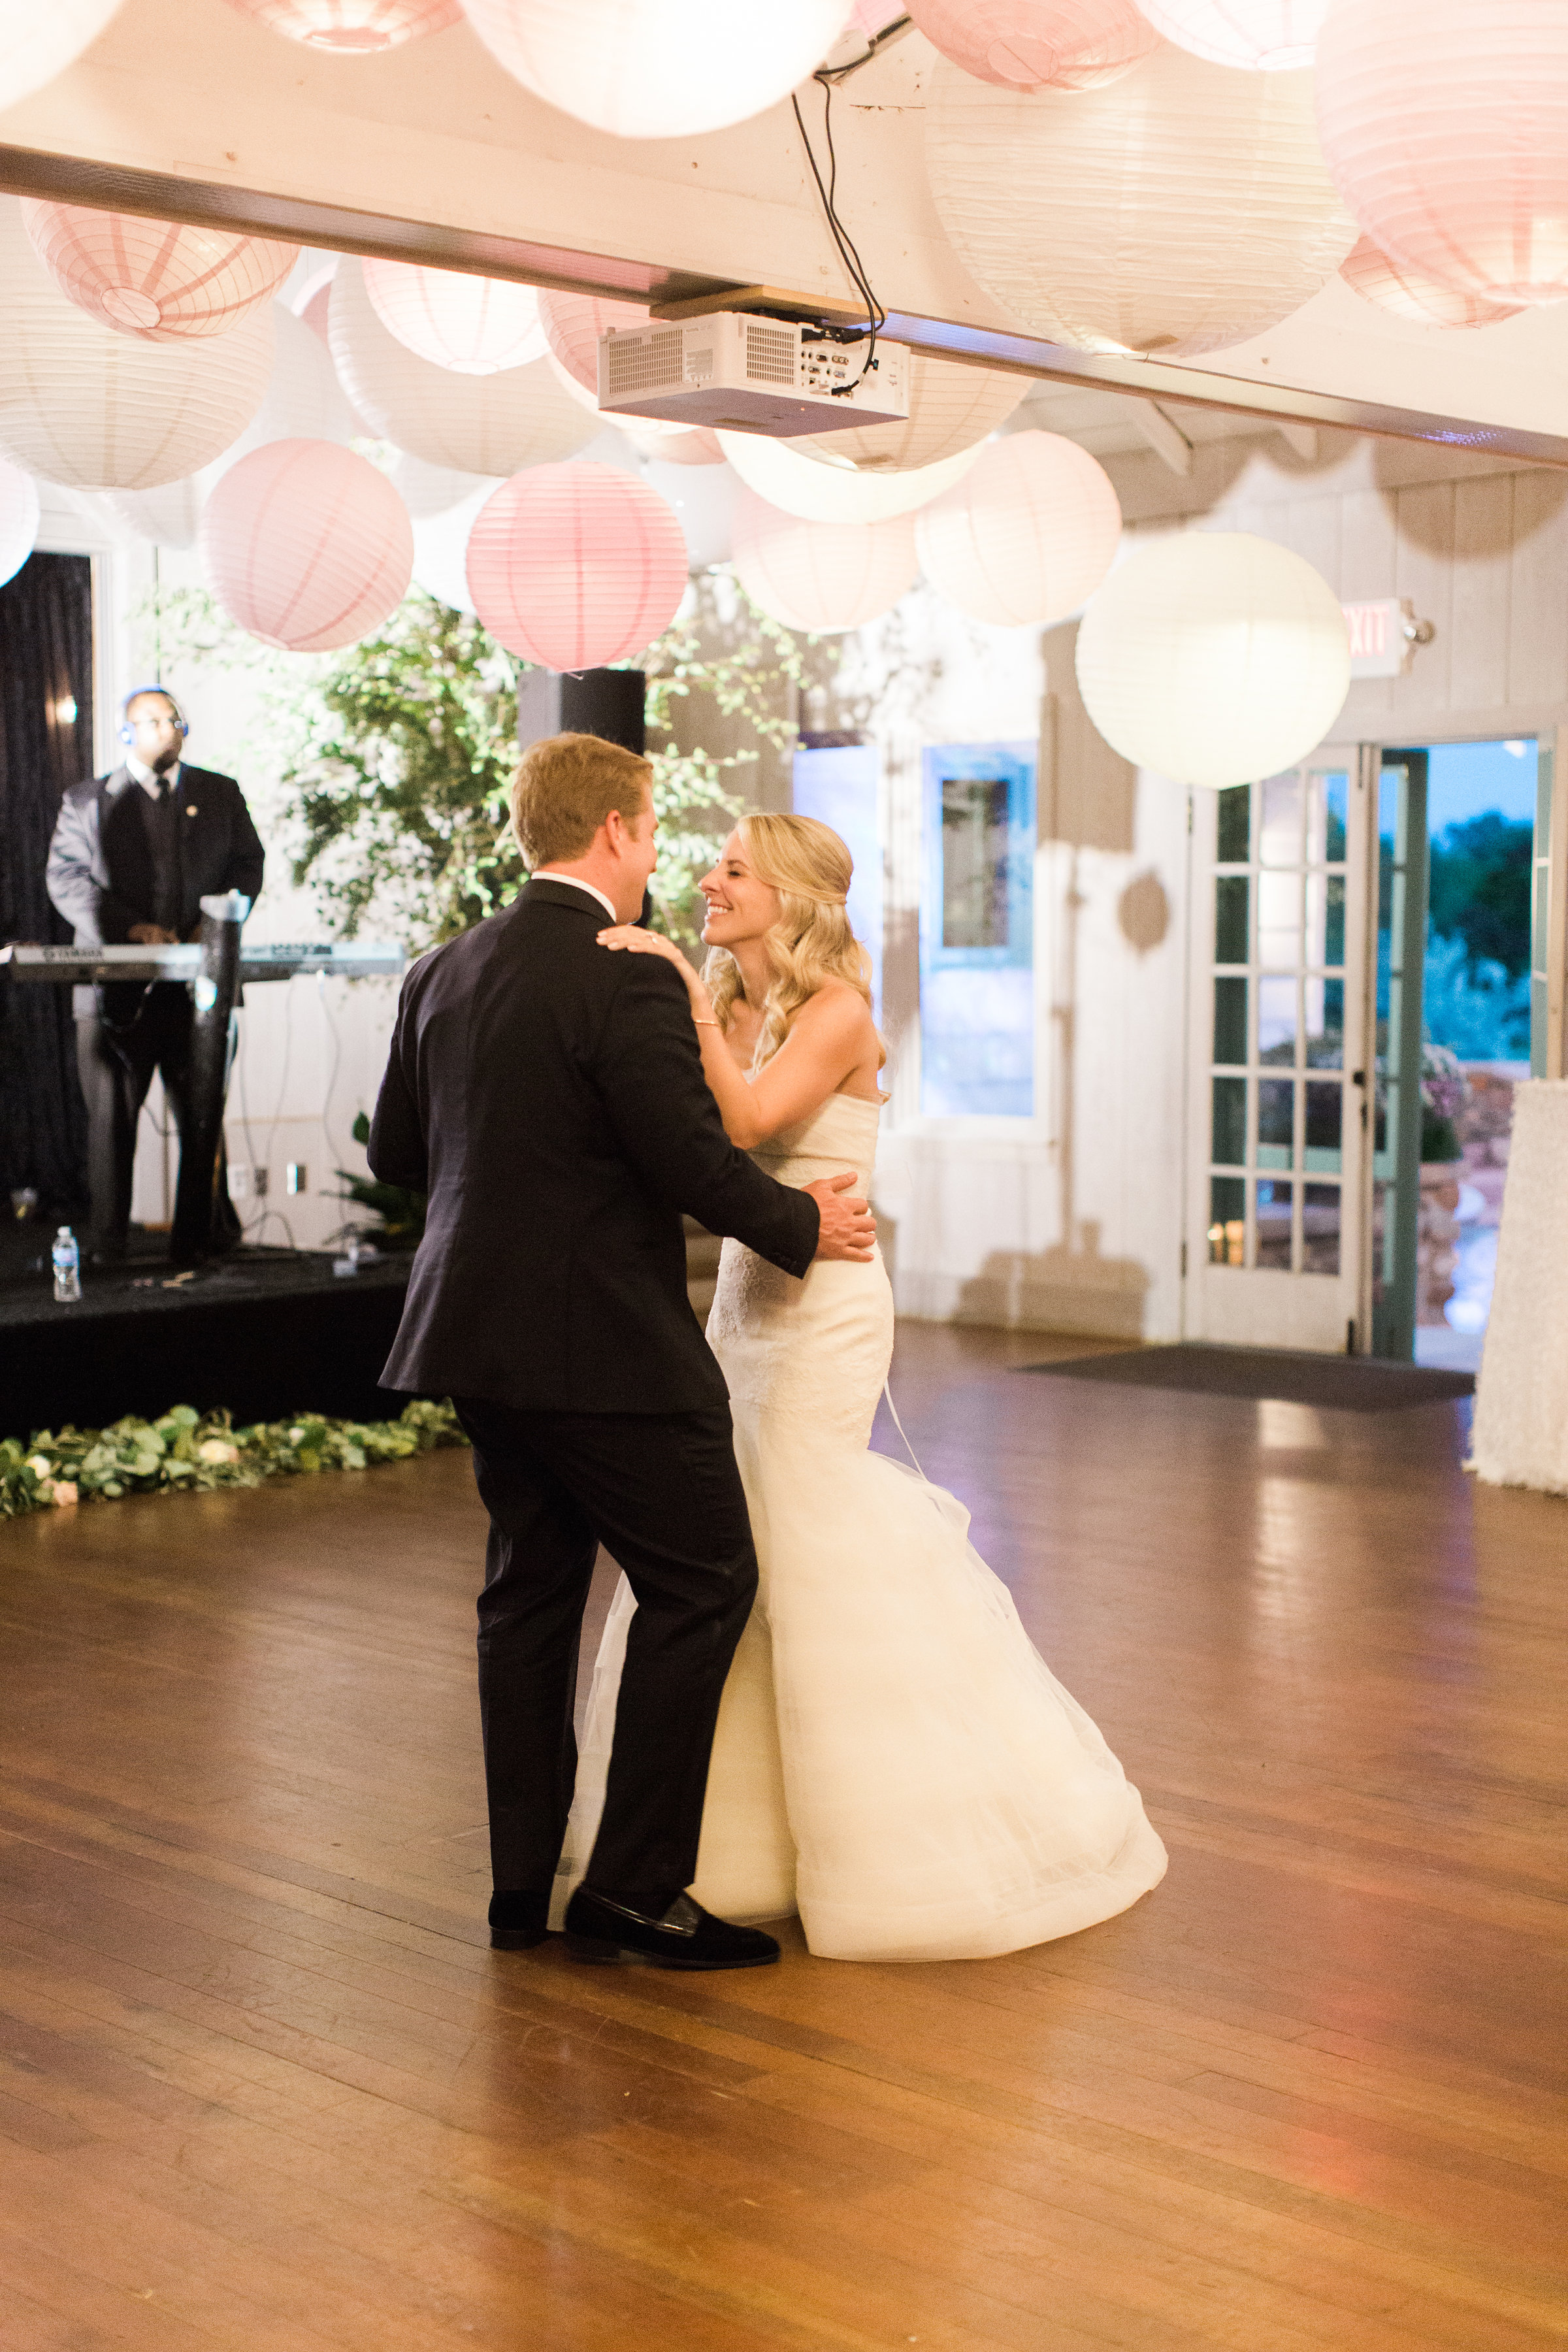 Coffman+Wedding+Reception-176.jpg